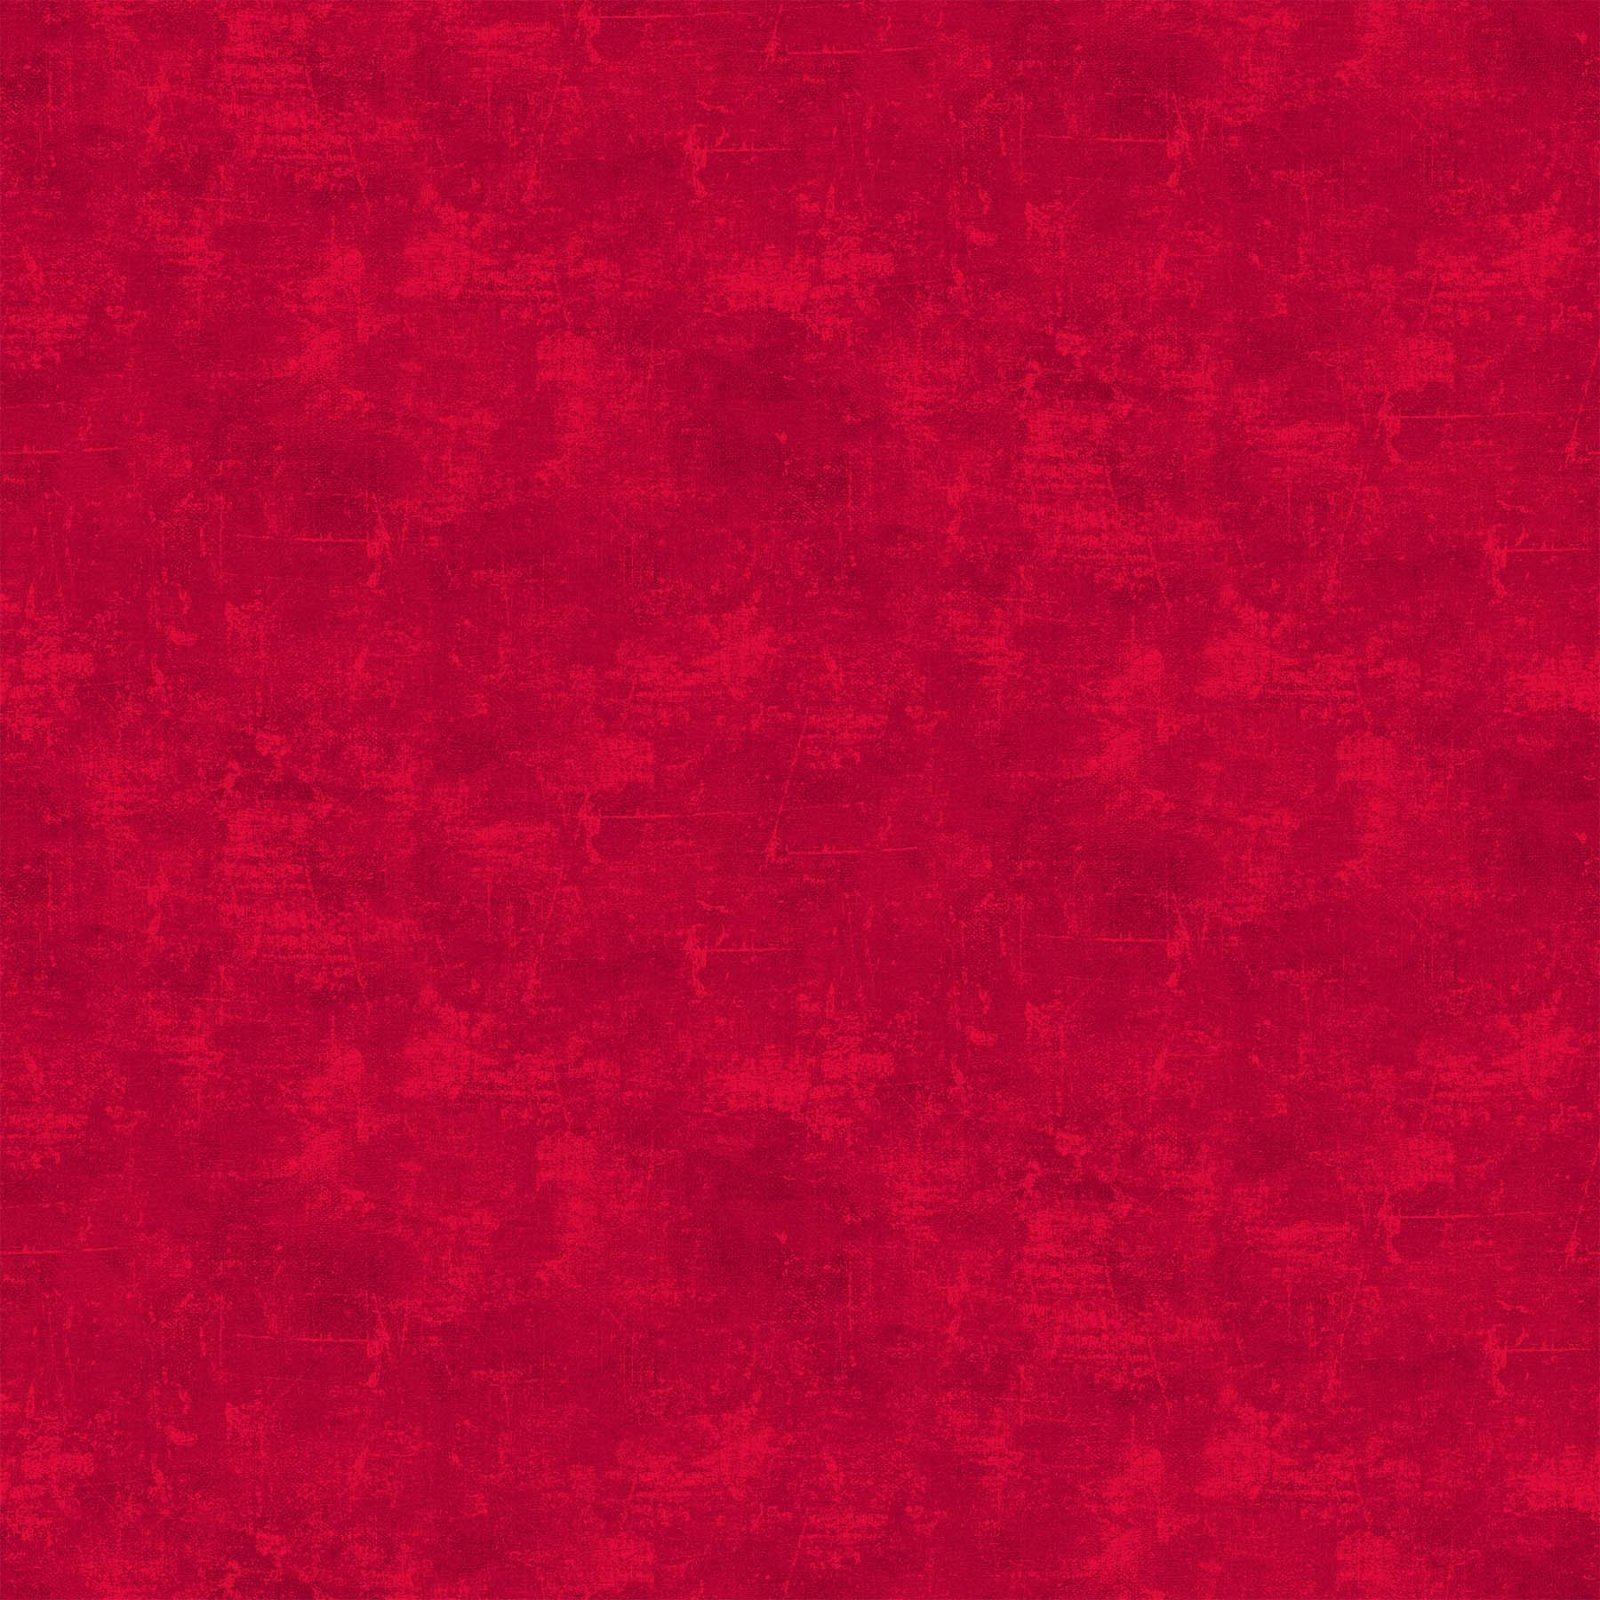 Canvas 9030-25 by Northcott Fabrics